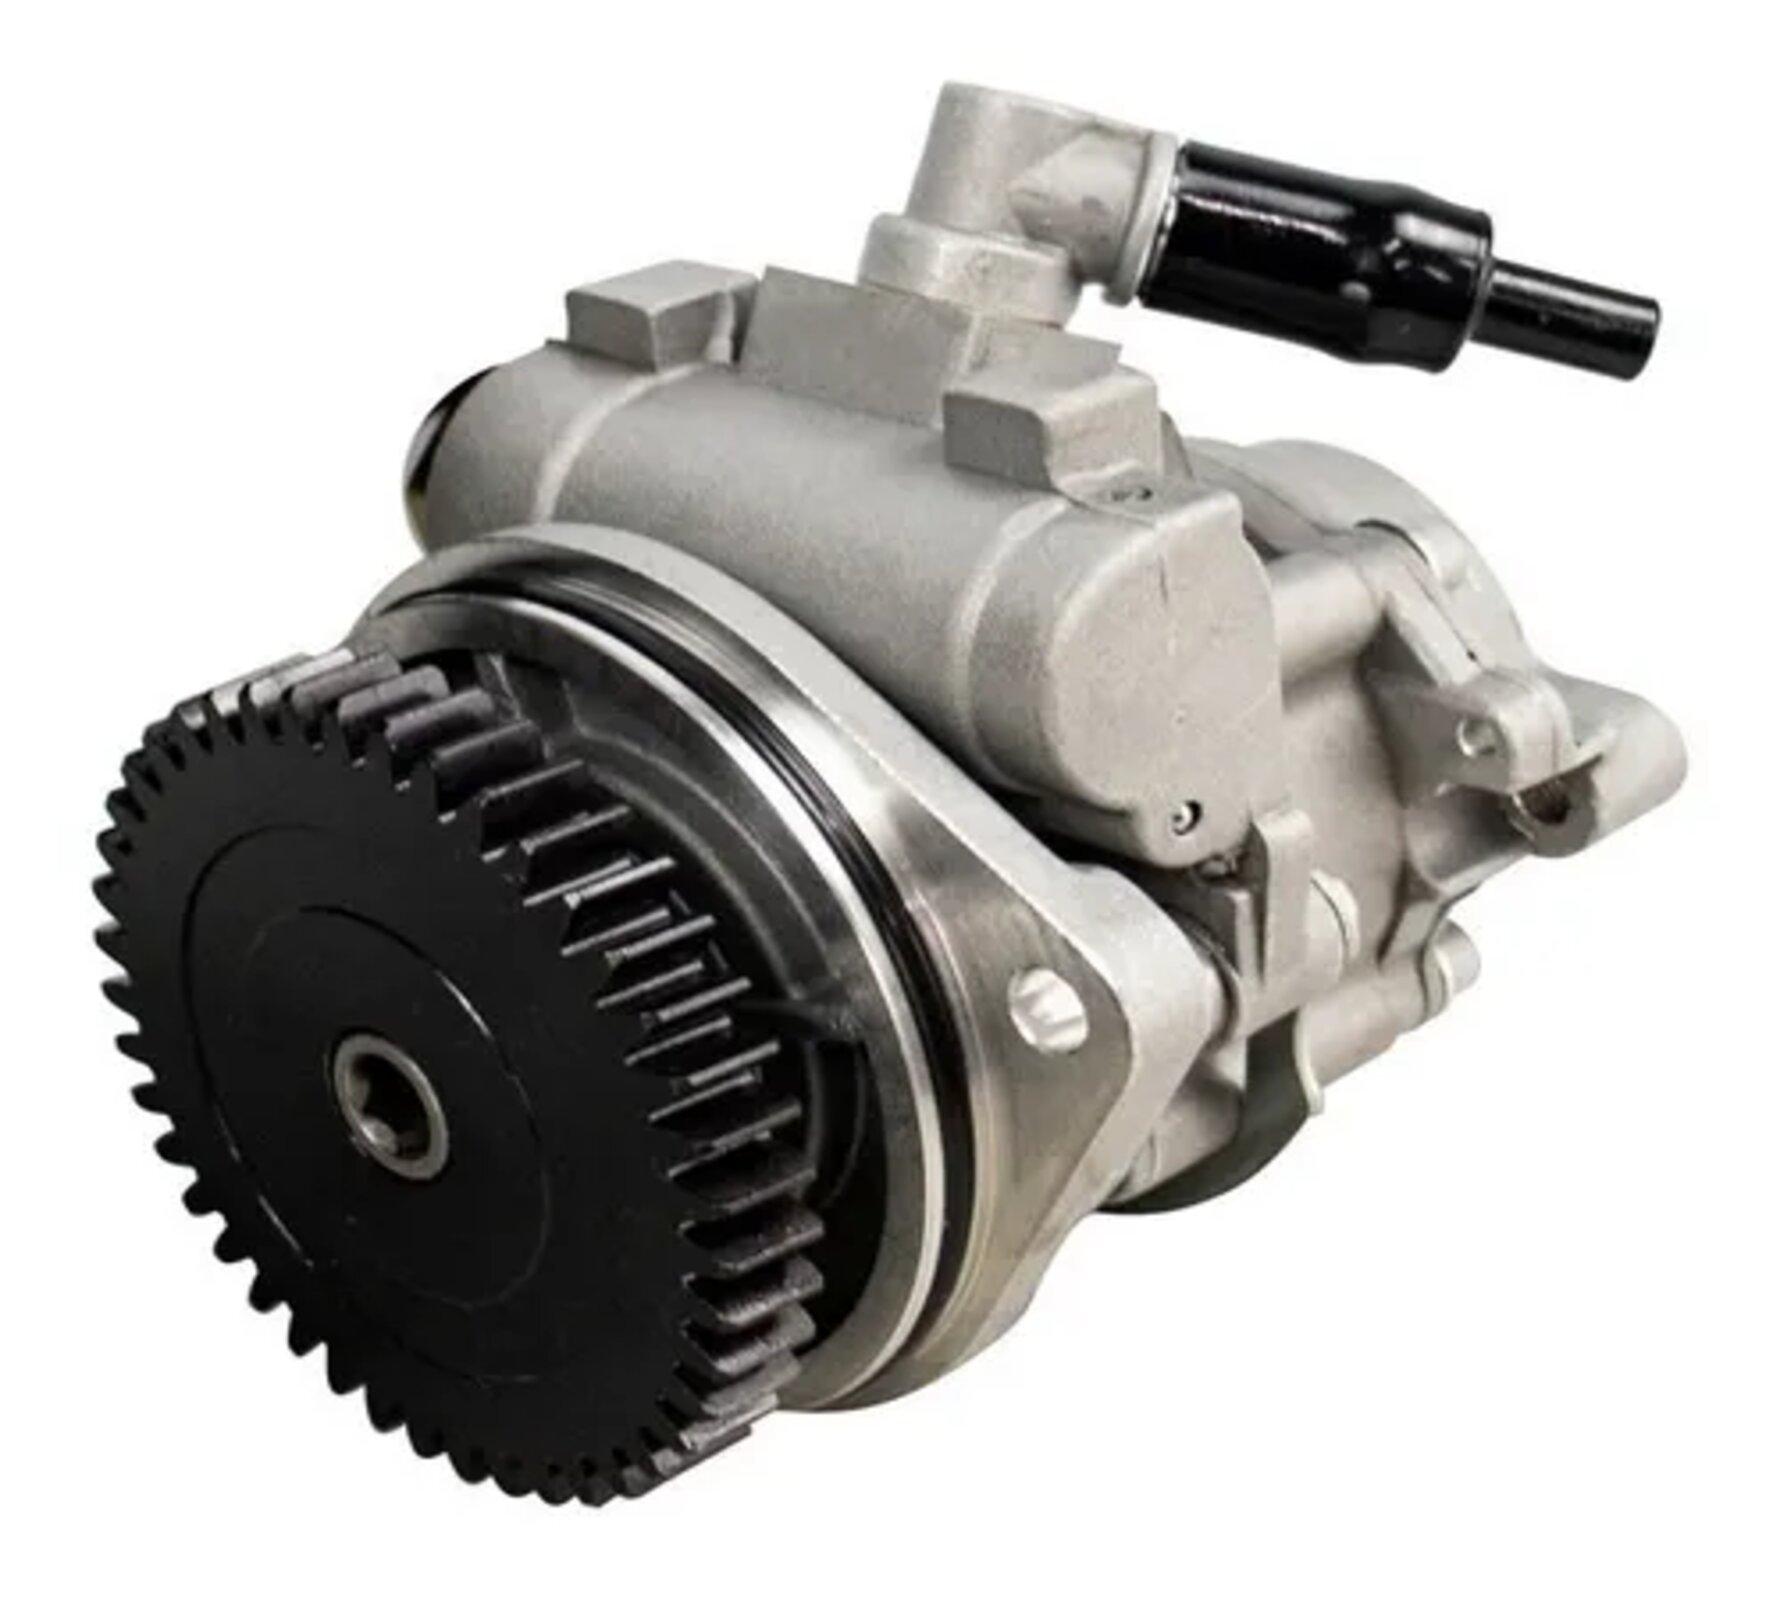 Bomba Direção Hidráulica Blazer S10 2.8 4 Cil Mwm Sprint 4.0